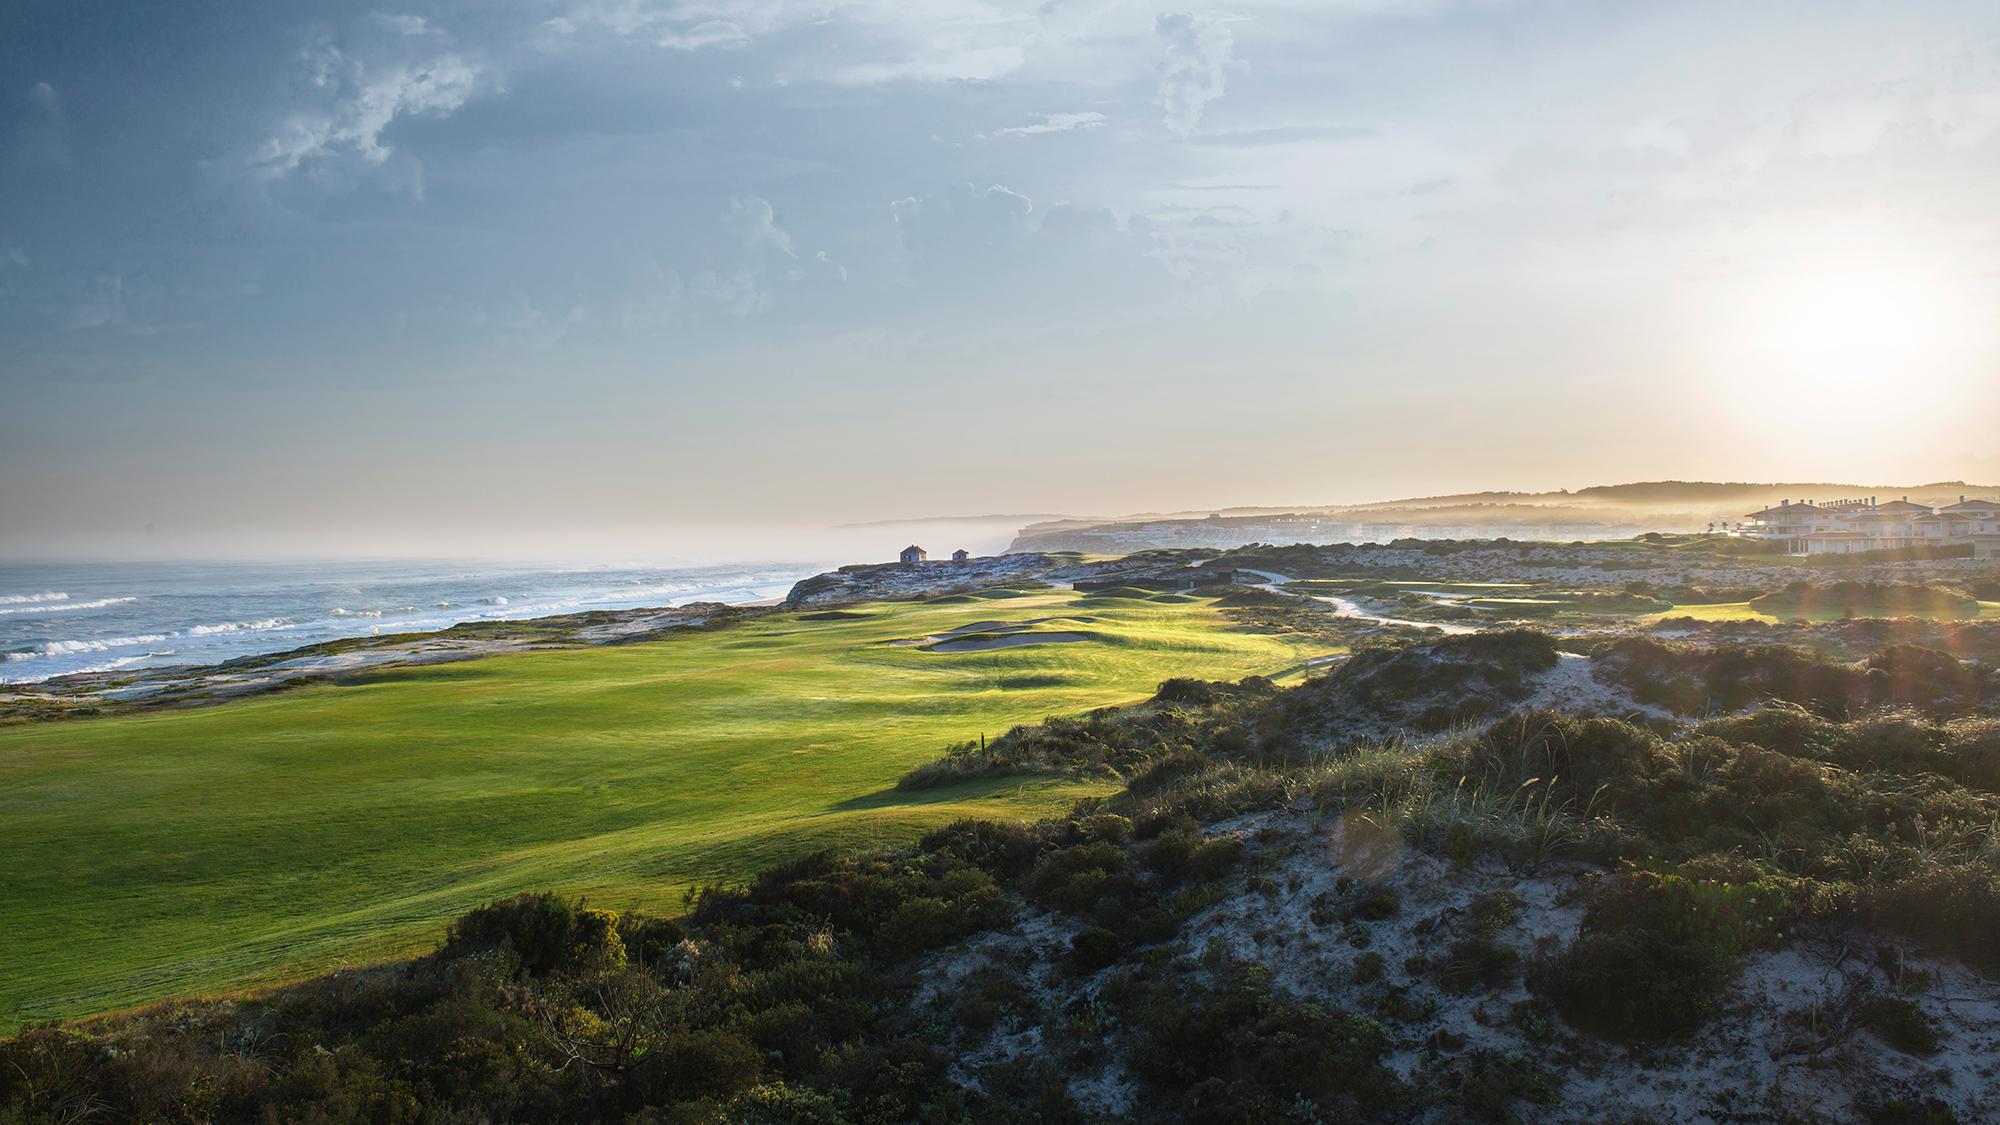 New Partner Tag puts Praia D'El Rey in a class of its own